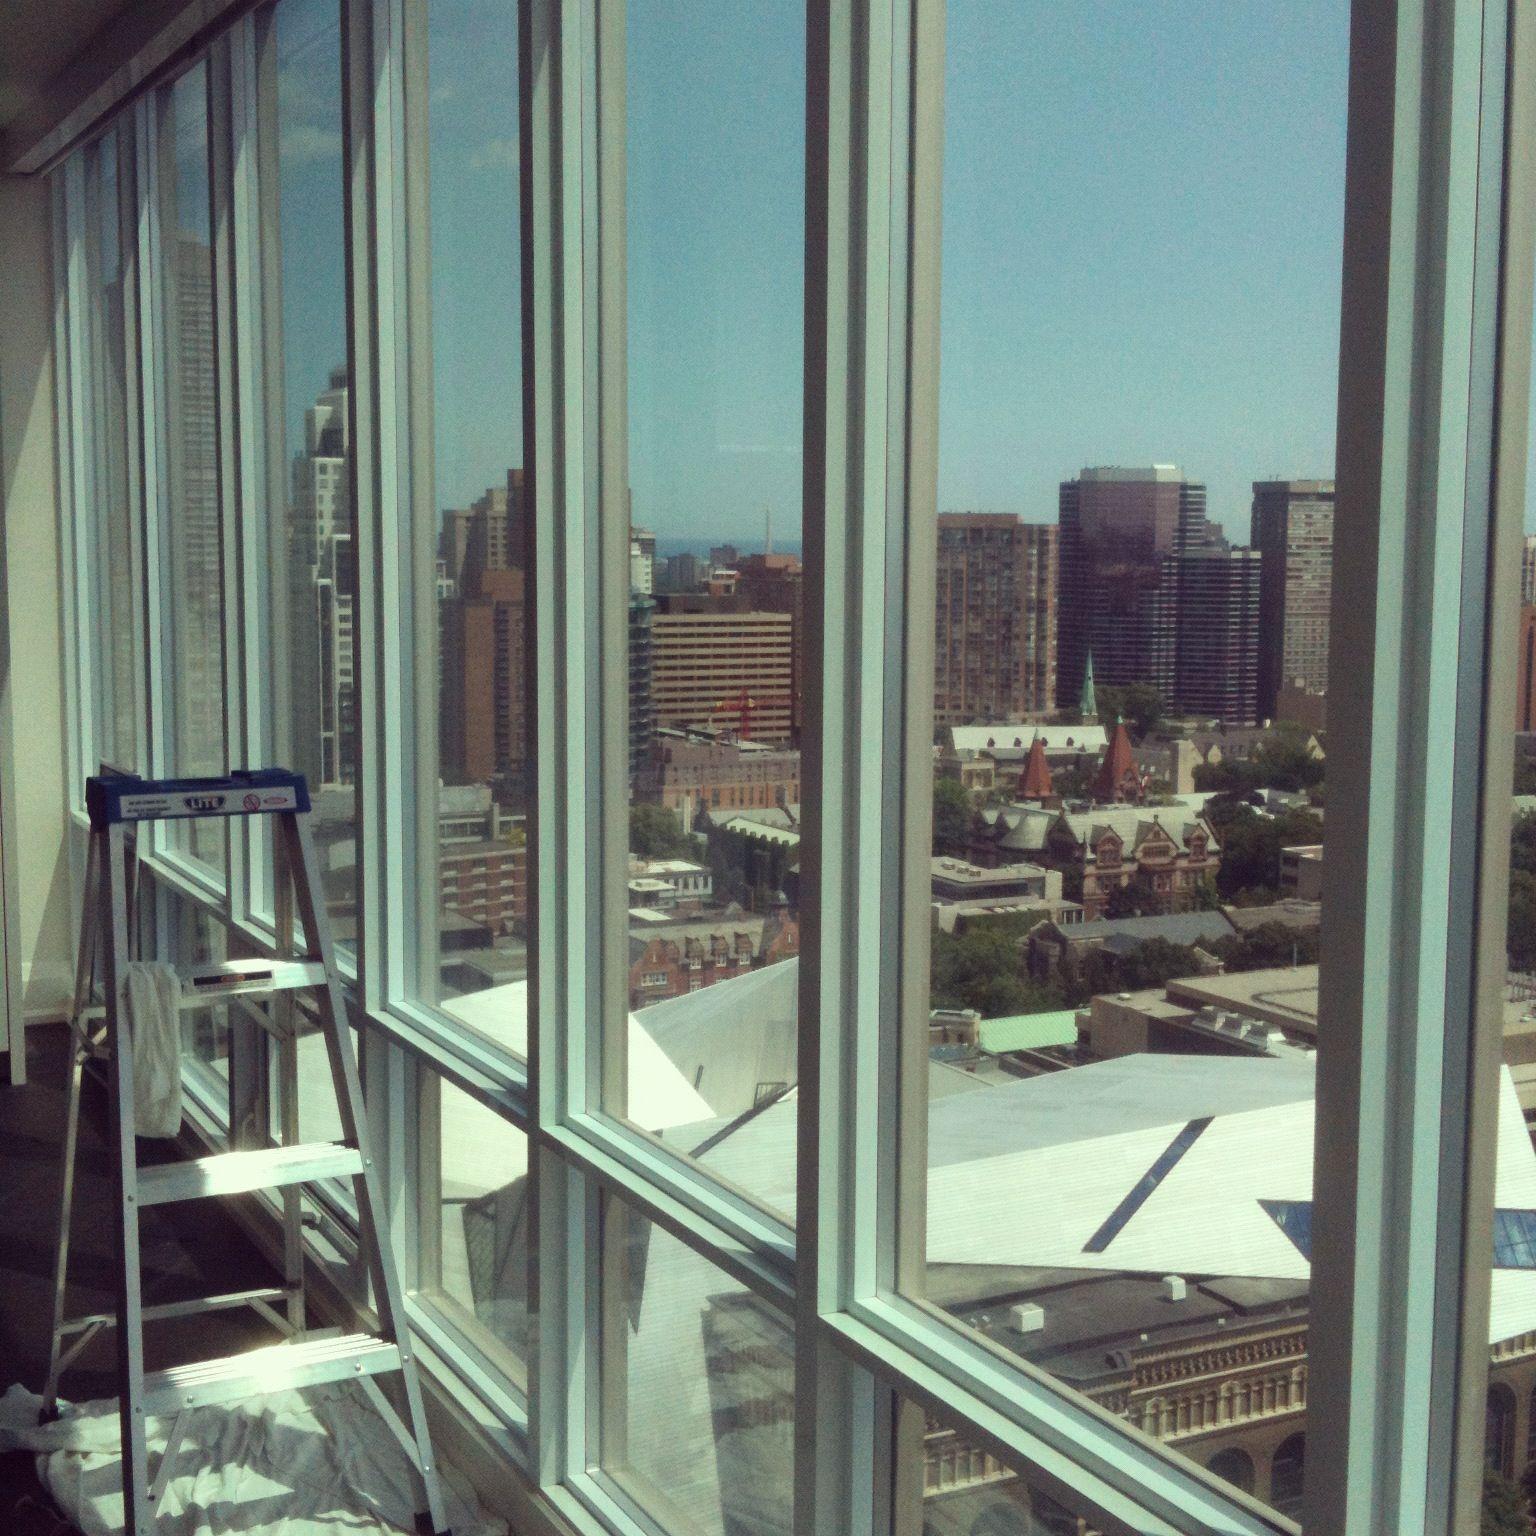 3m Prestige 70 Window Film Applied To Condominium Windows